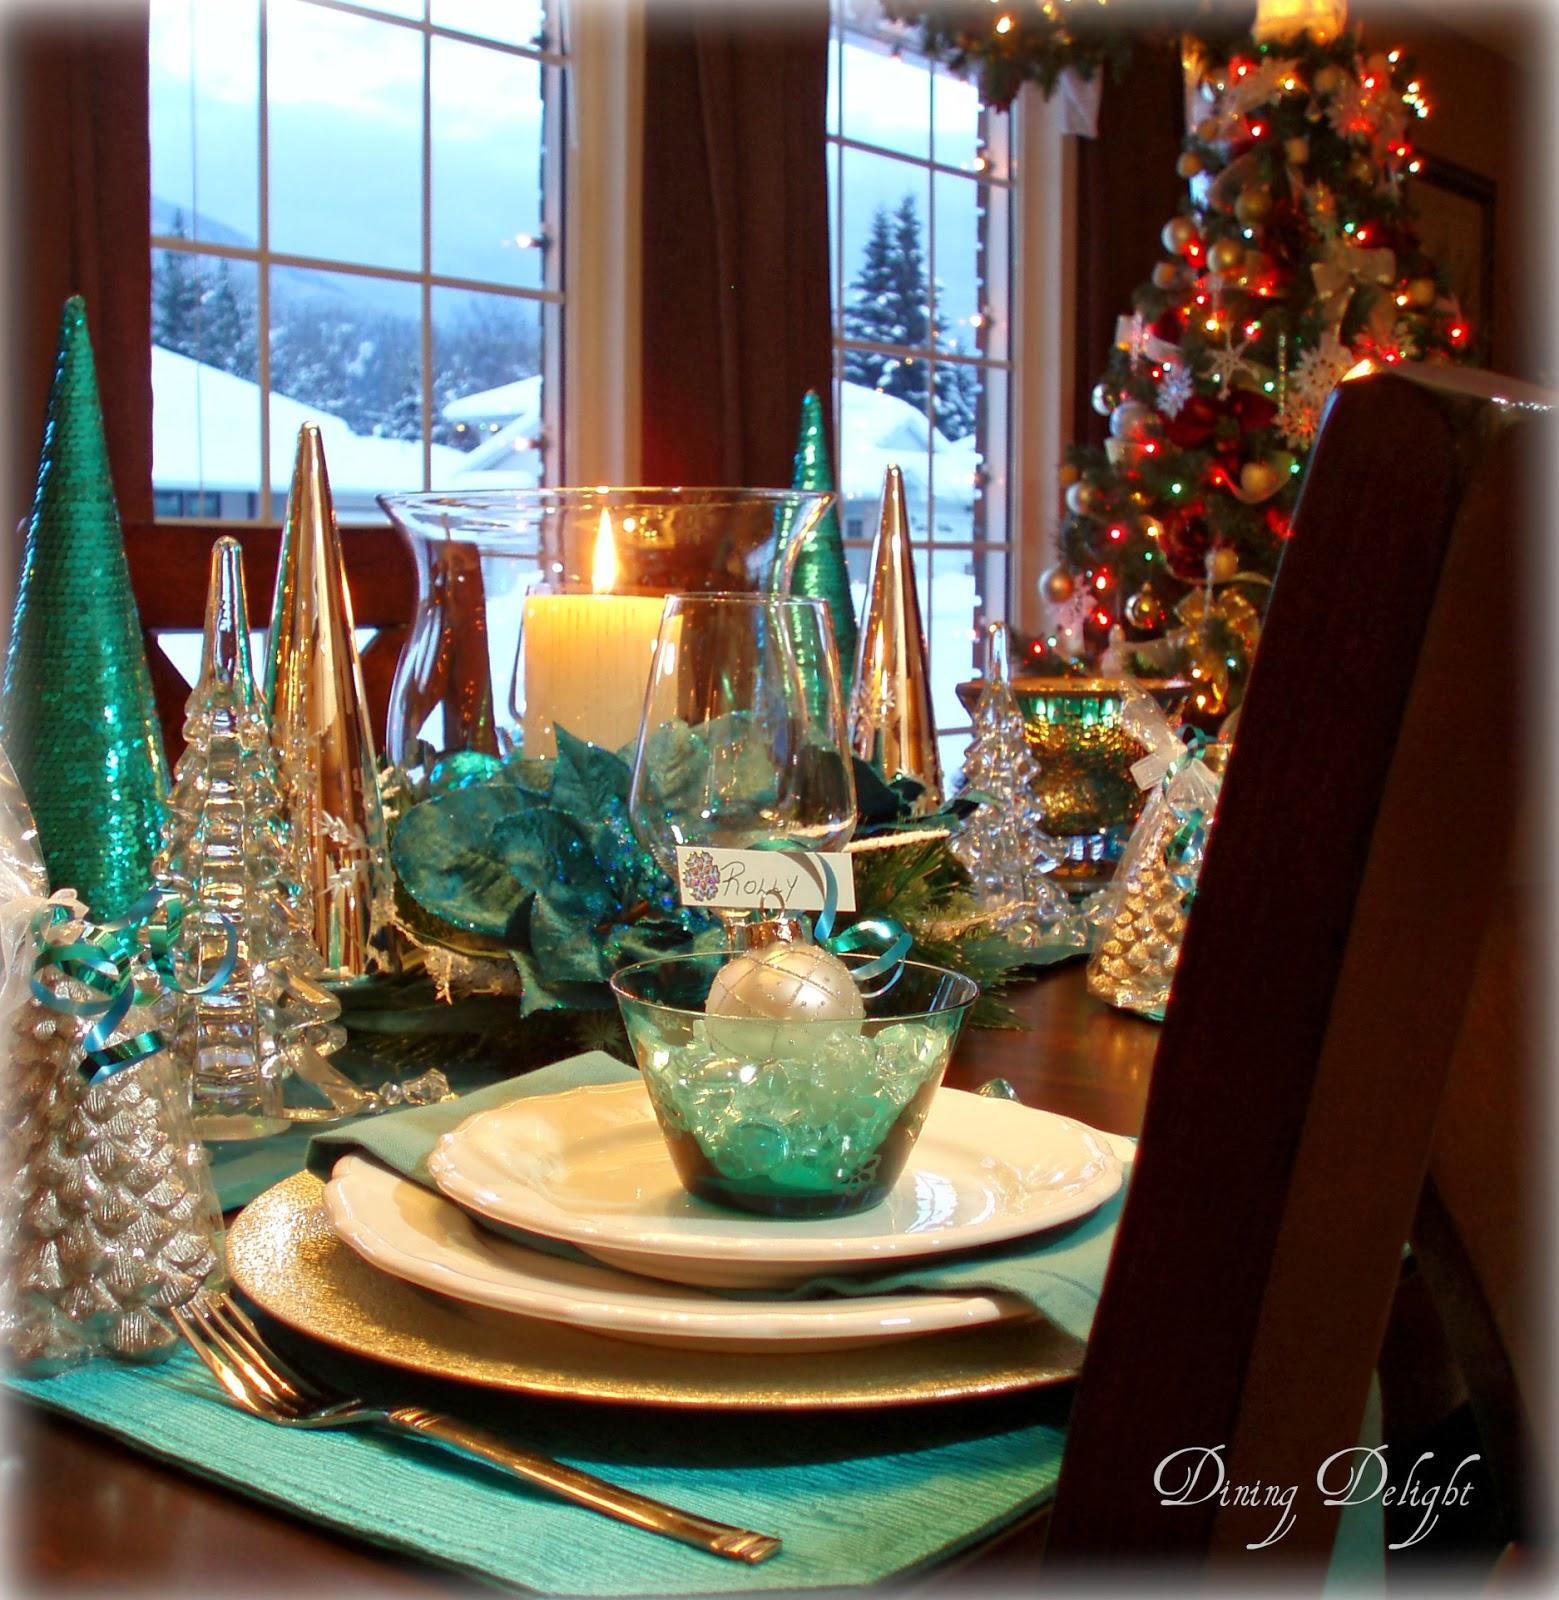 Christmas Dining Room Ideas To Add A Flourish To Christmas: Dining Delight: Christmas In Teal Blue